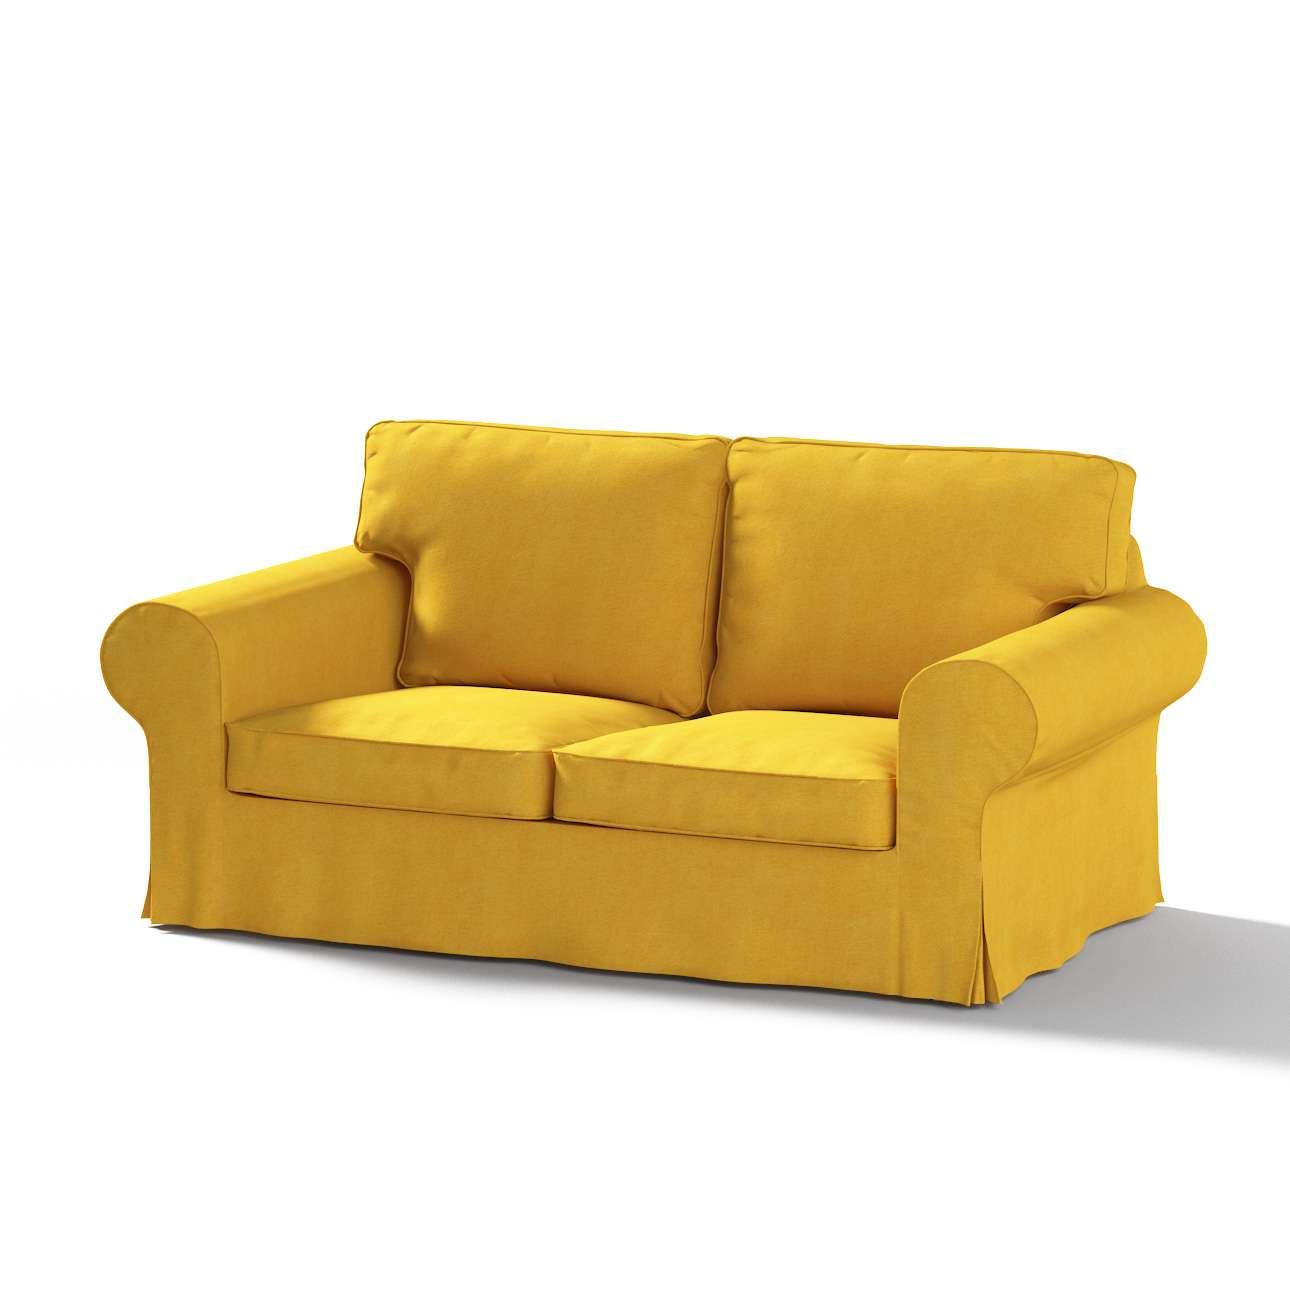 Ektorp 2-Sitzer Schlafsofabezug  ALTES Modell Sofabezug Ektorp 2-Sitzer Schlafsofa altes Modell von der Kollektion Etna, Stoff: 705-04